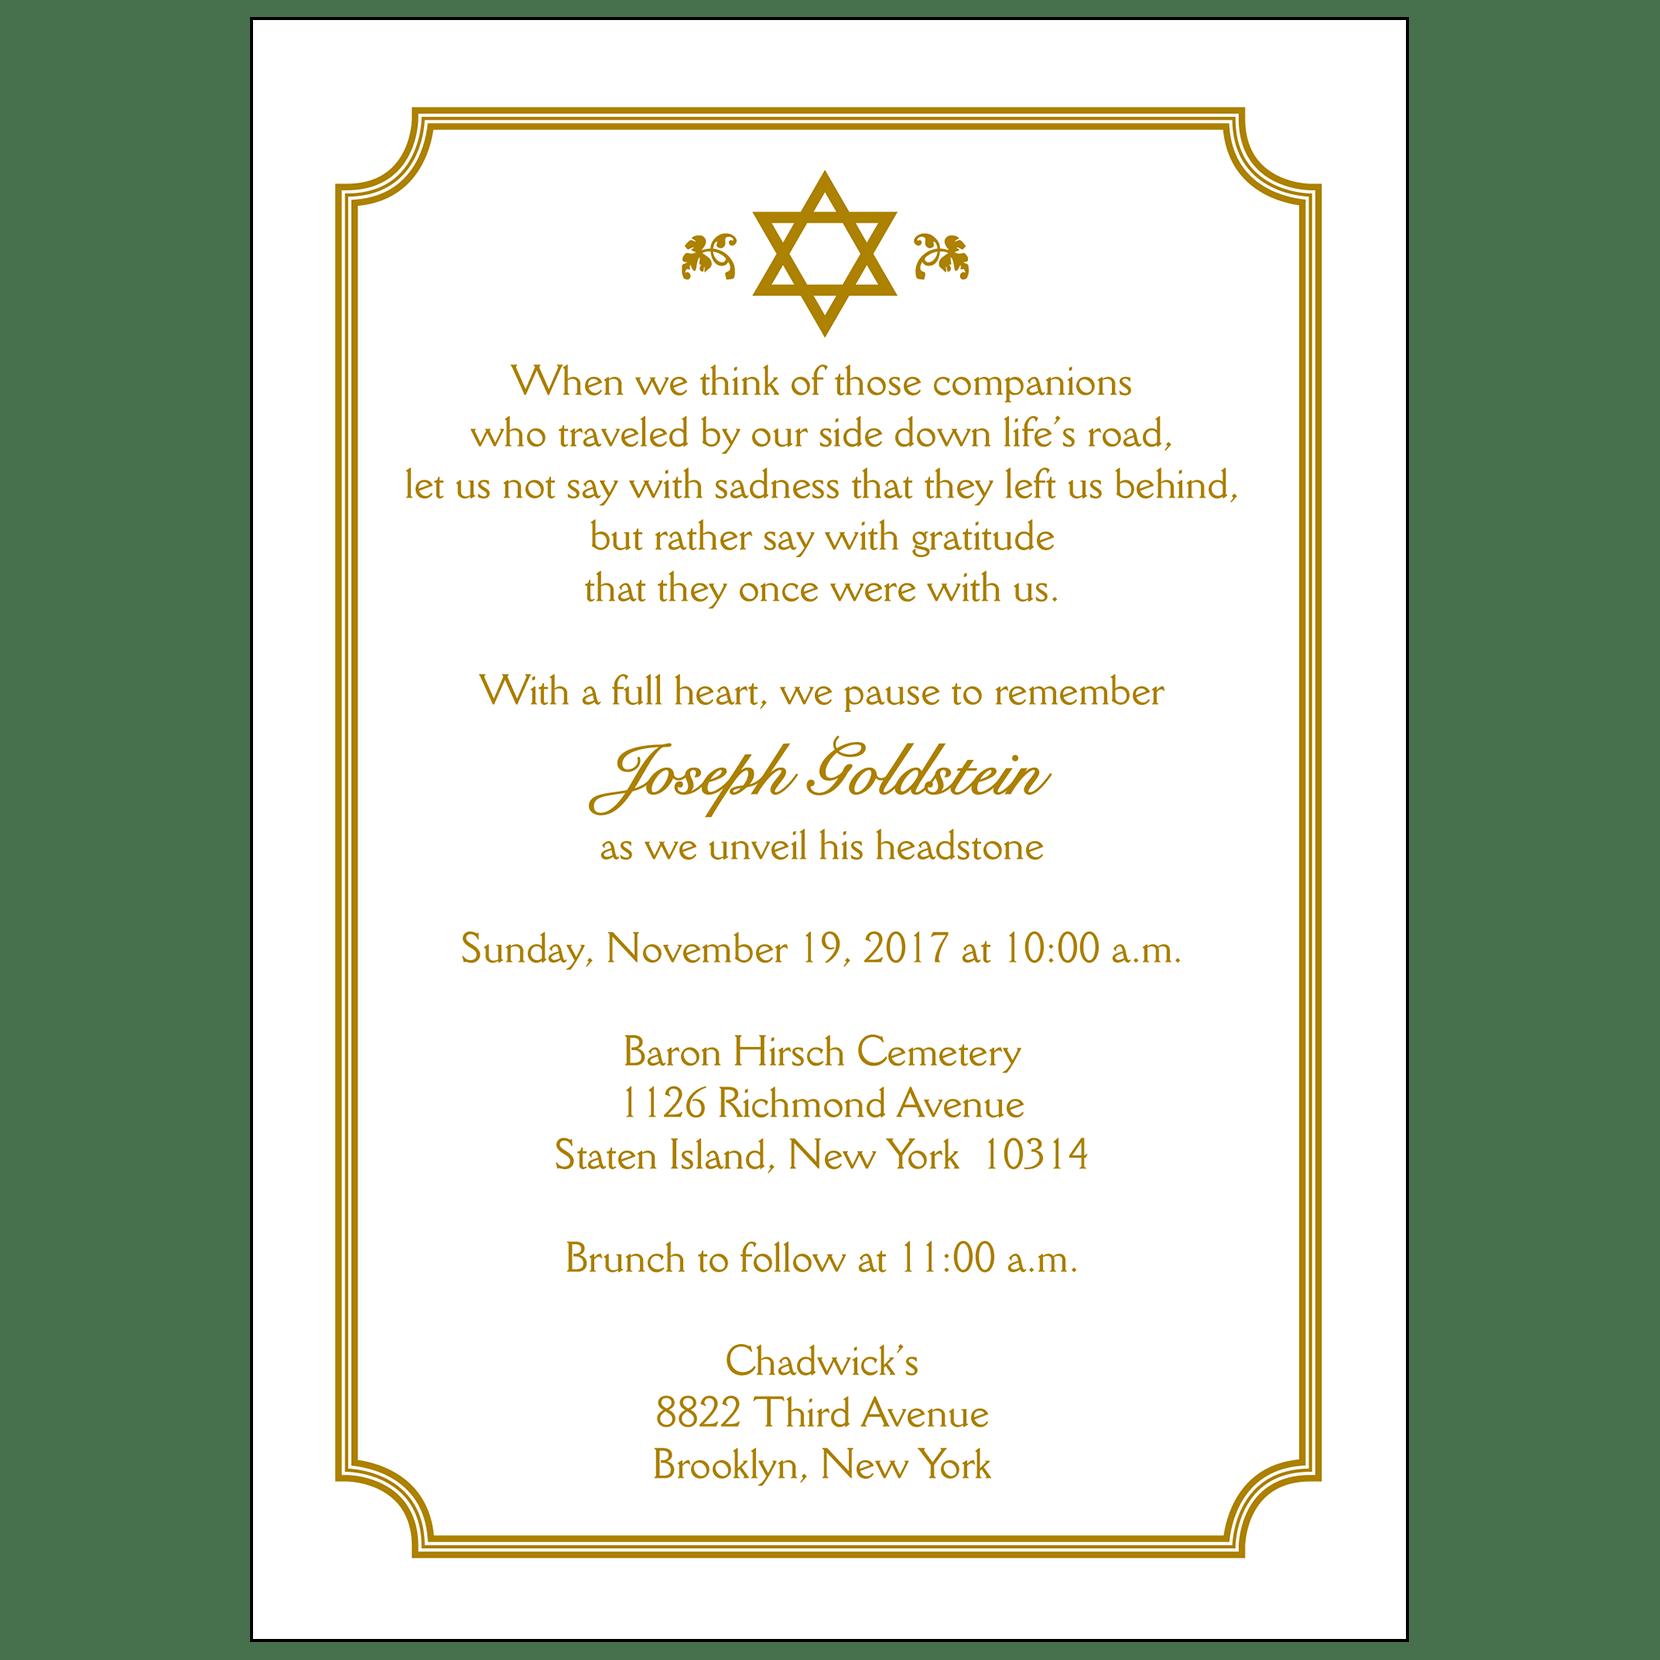 unveiling of tombstone invitation wording